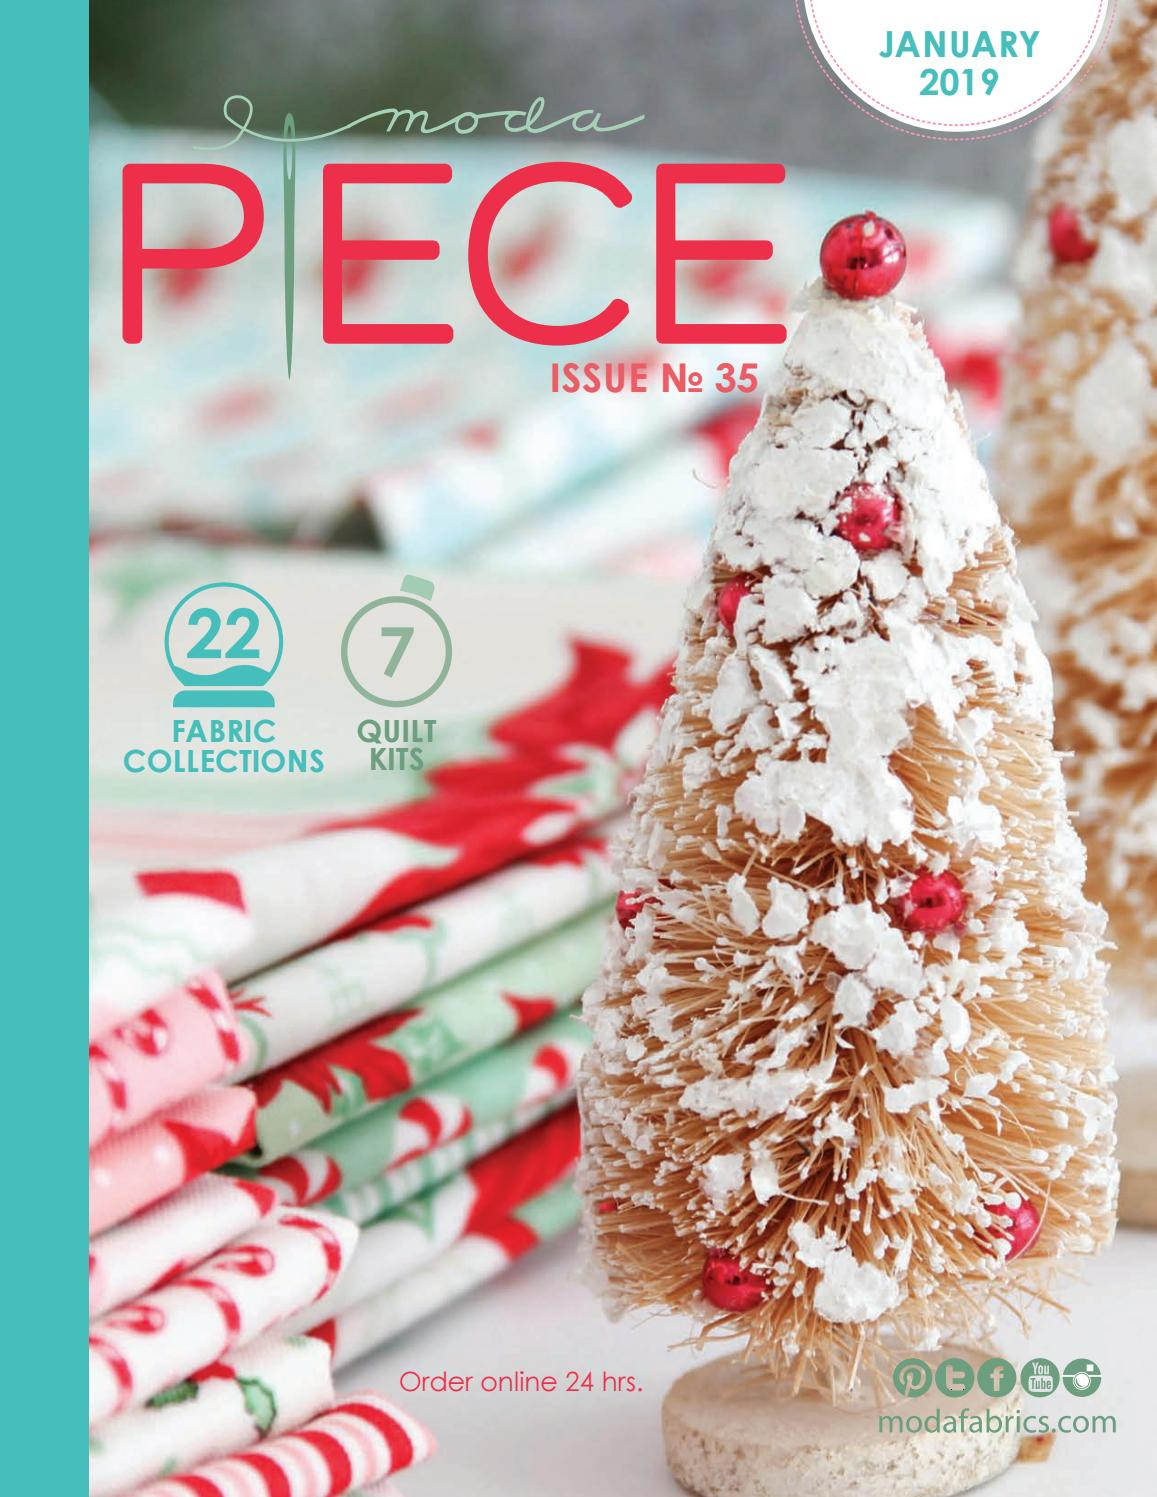 Moda Christmas Fabric 2019.Moda Piece Issue No 35 By Moda Fabrics United Notions Issuu